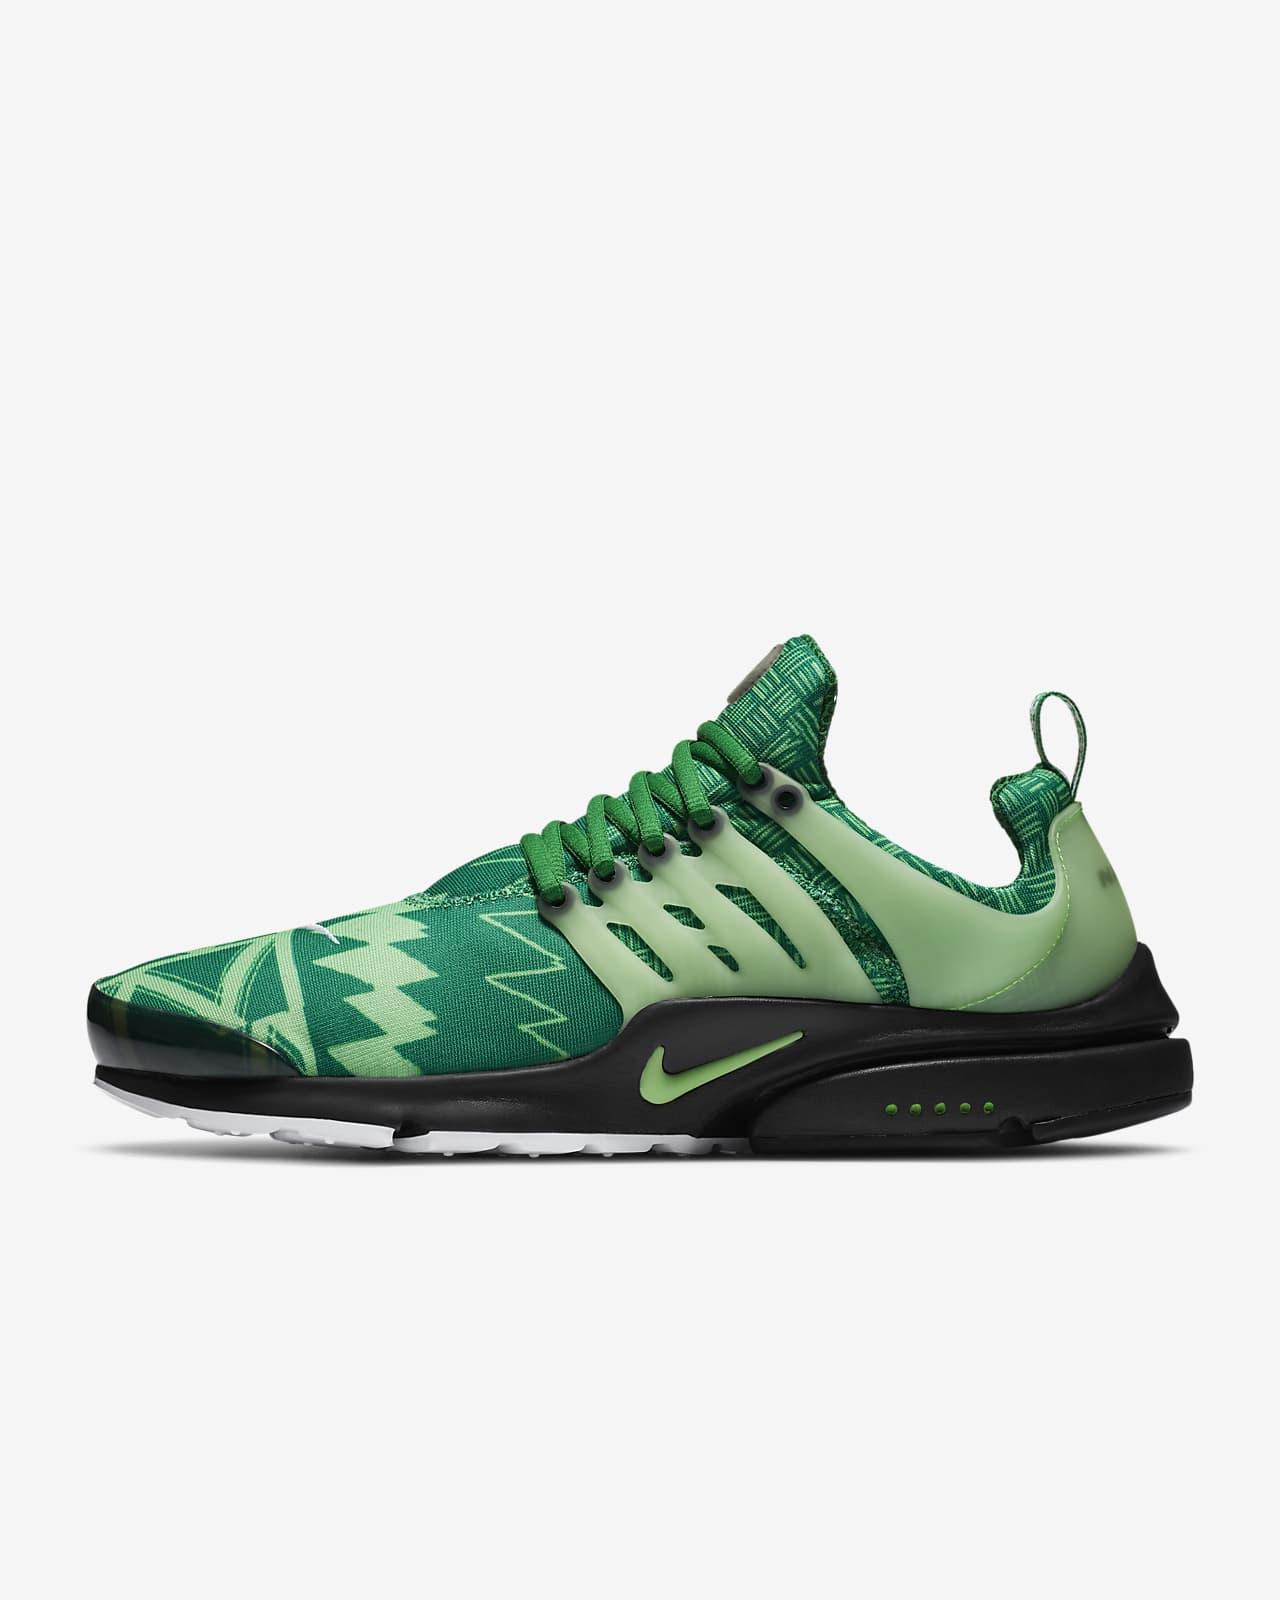 Chaussure Nike Air Presto pour Homme